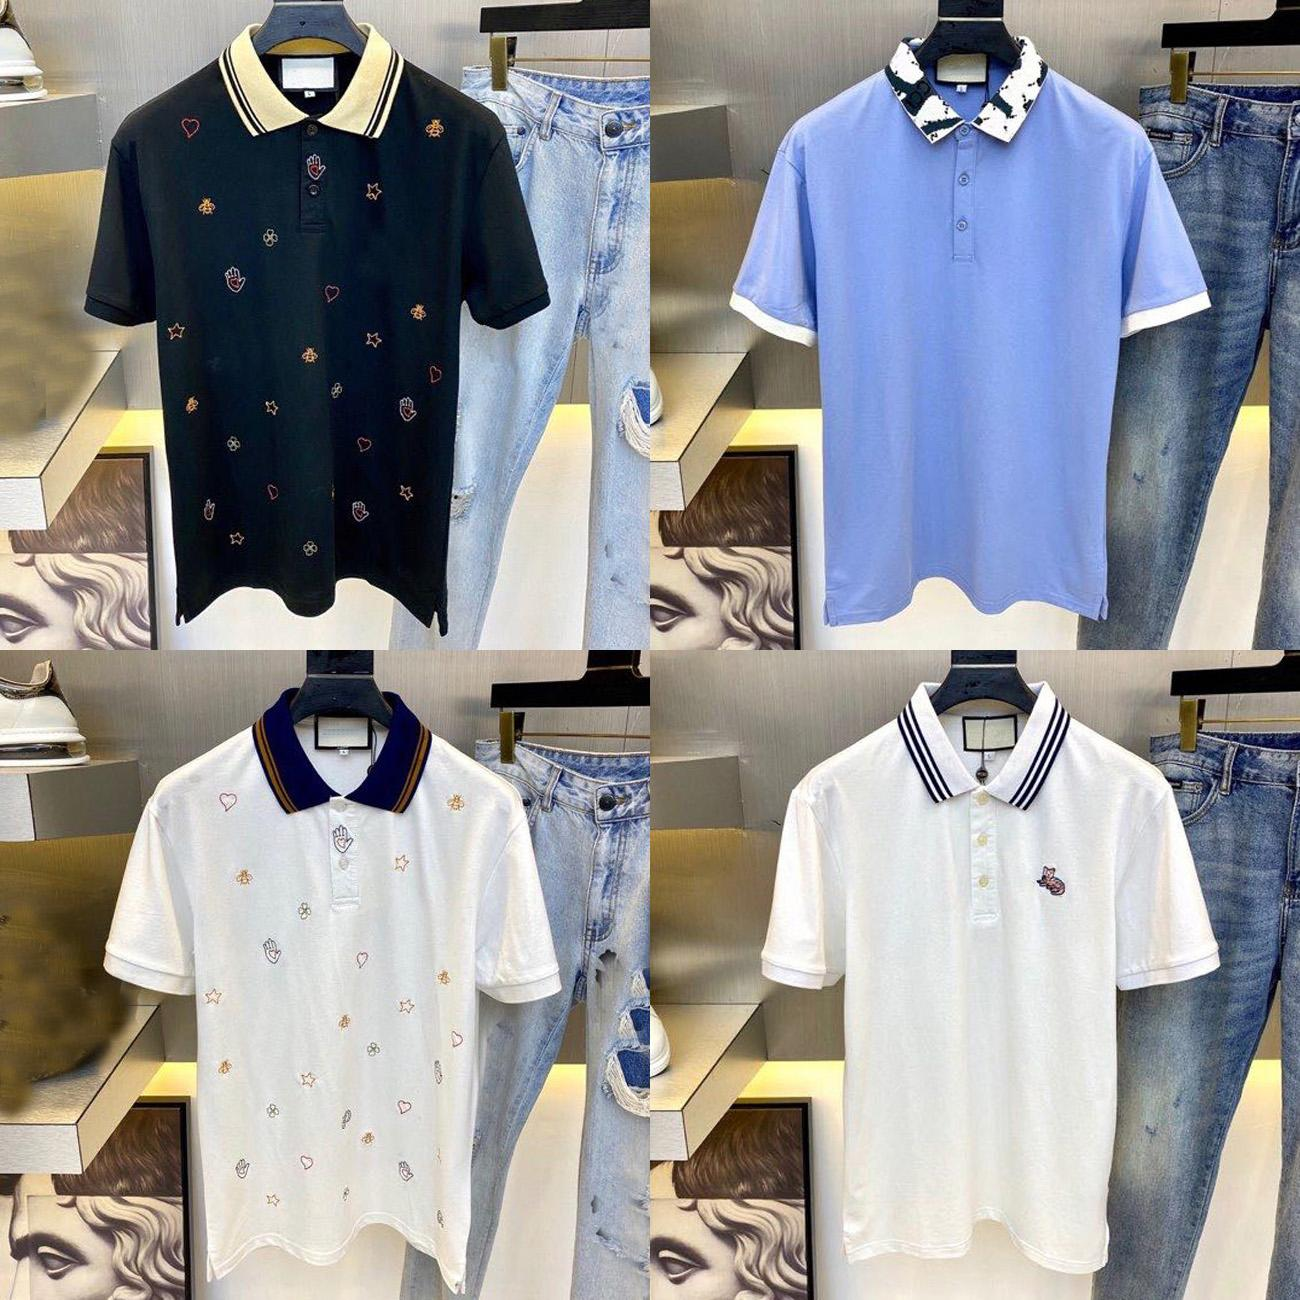 21SS 탑 QAULITY 여름 남성 디자이너 티셔츠 폴로 코튼 티셔츠 패션 캐주얼 커플 반팔 티 남성 티셔츠 비즈니스 폴로스